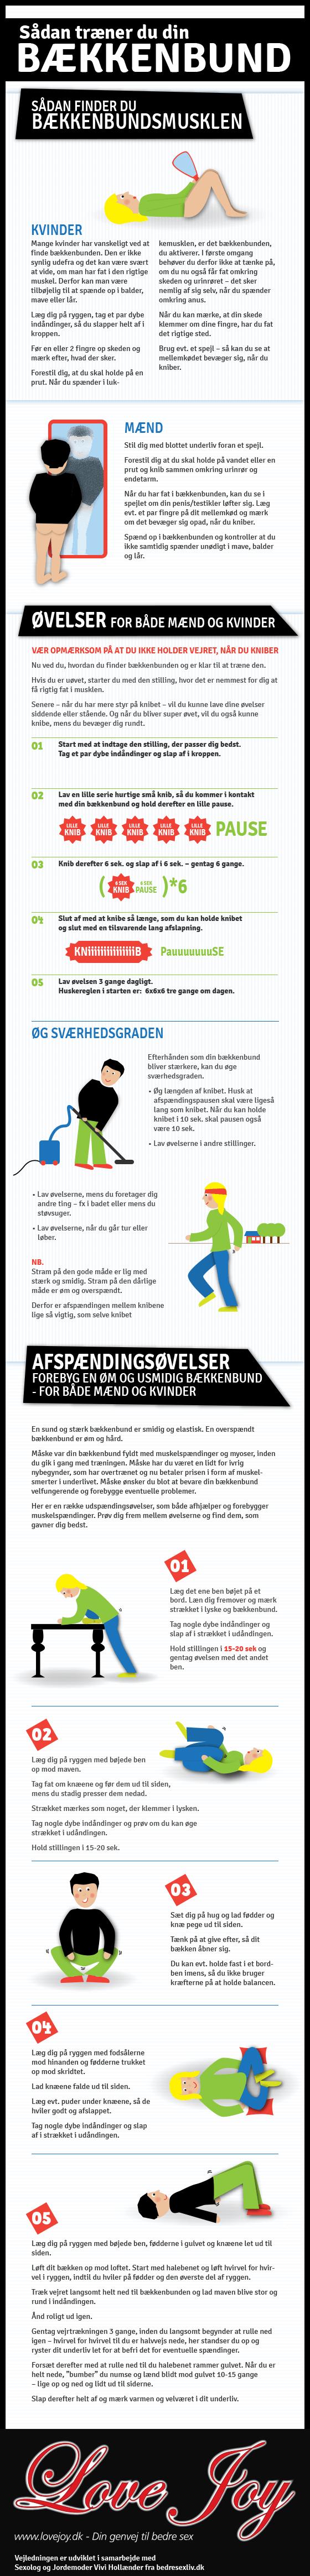 Bækkenbund infografik